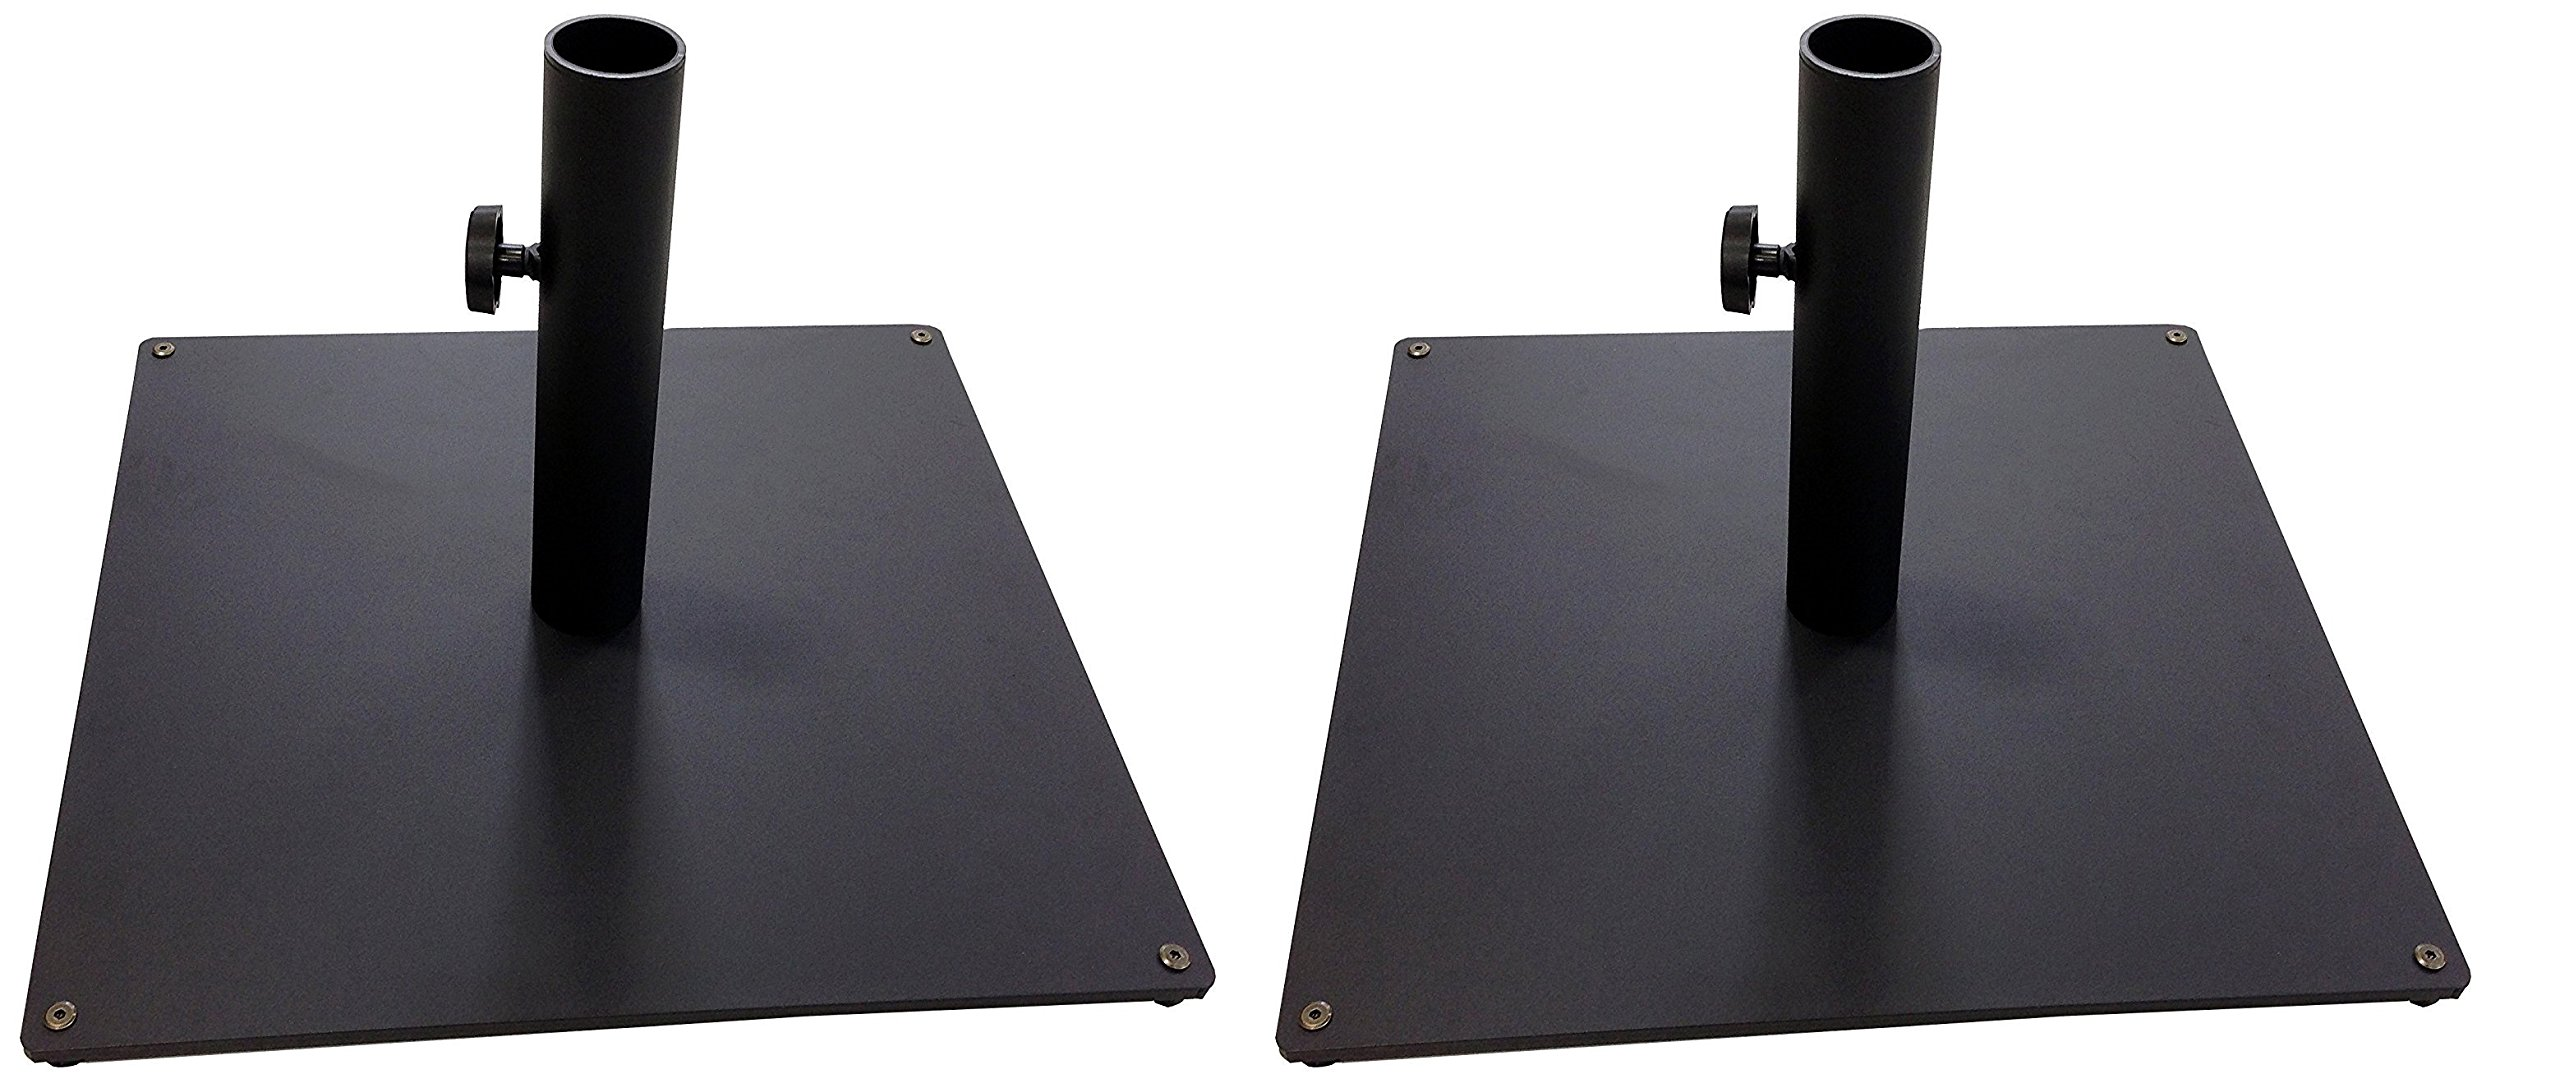 Tropishade Steel Plate Umbrella Base, 36 lbs, Black (Pack of 2)